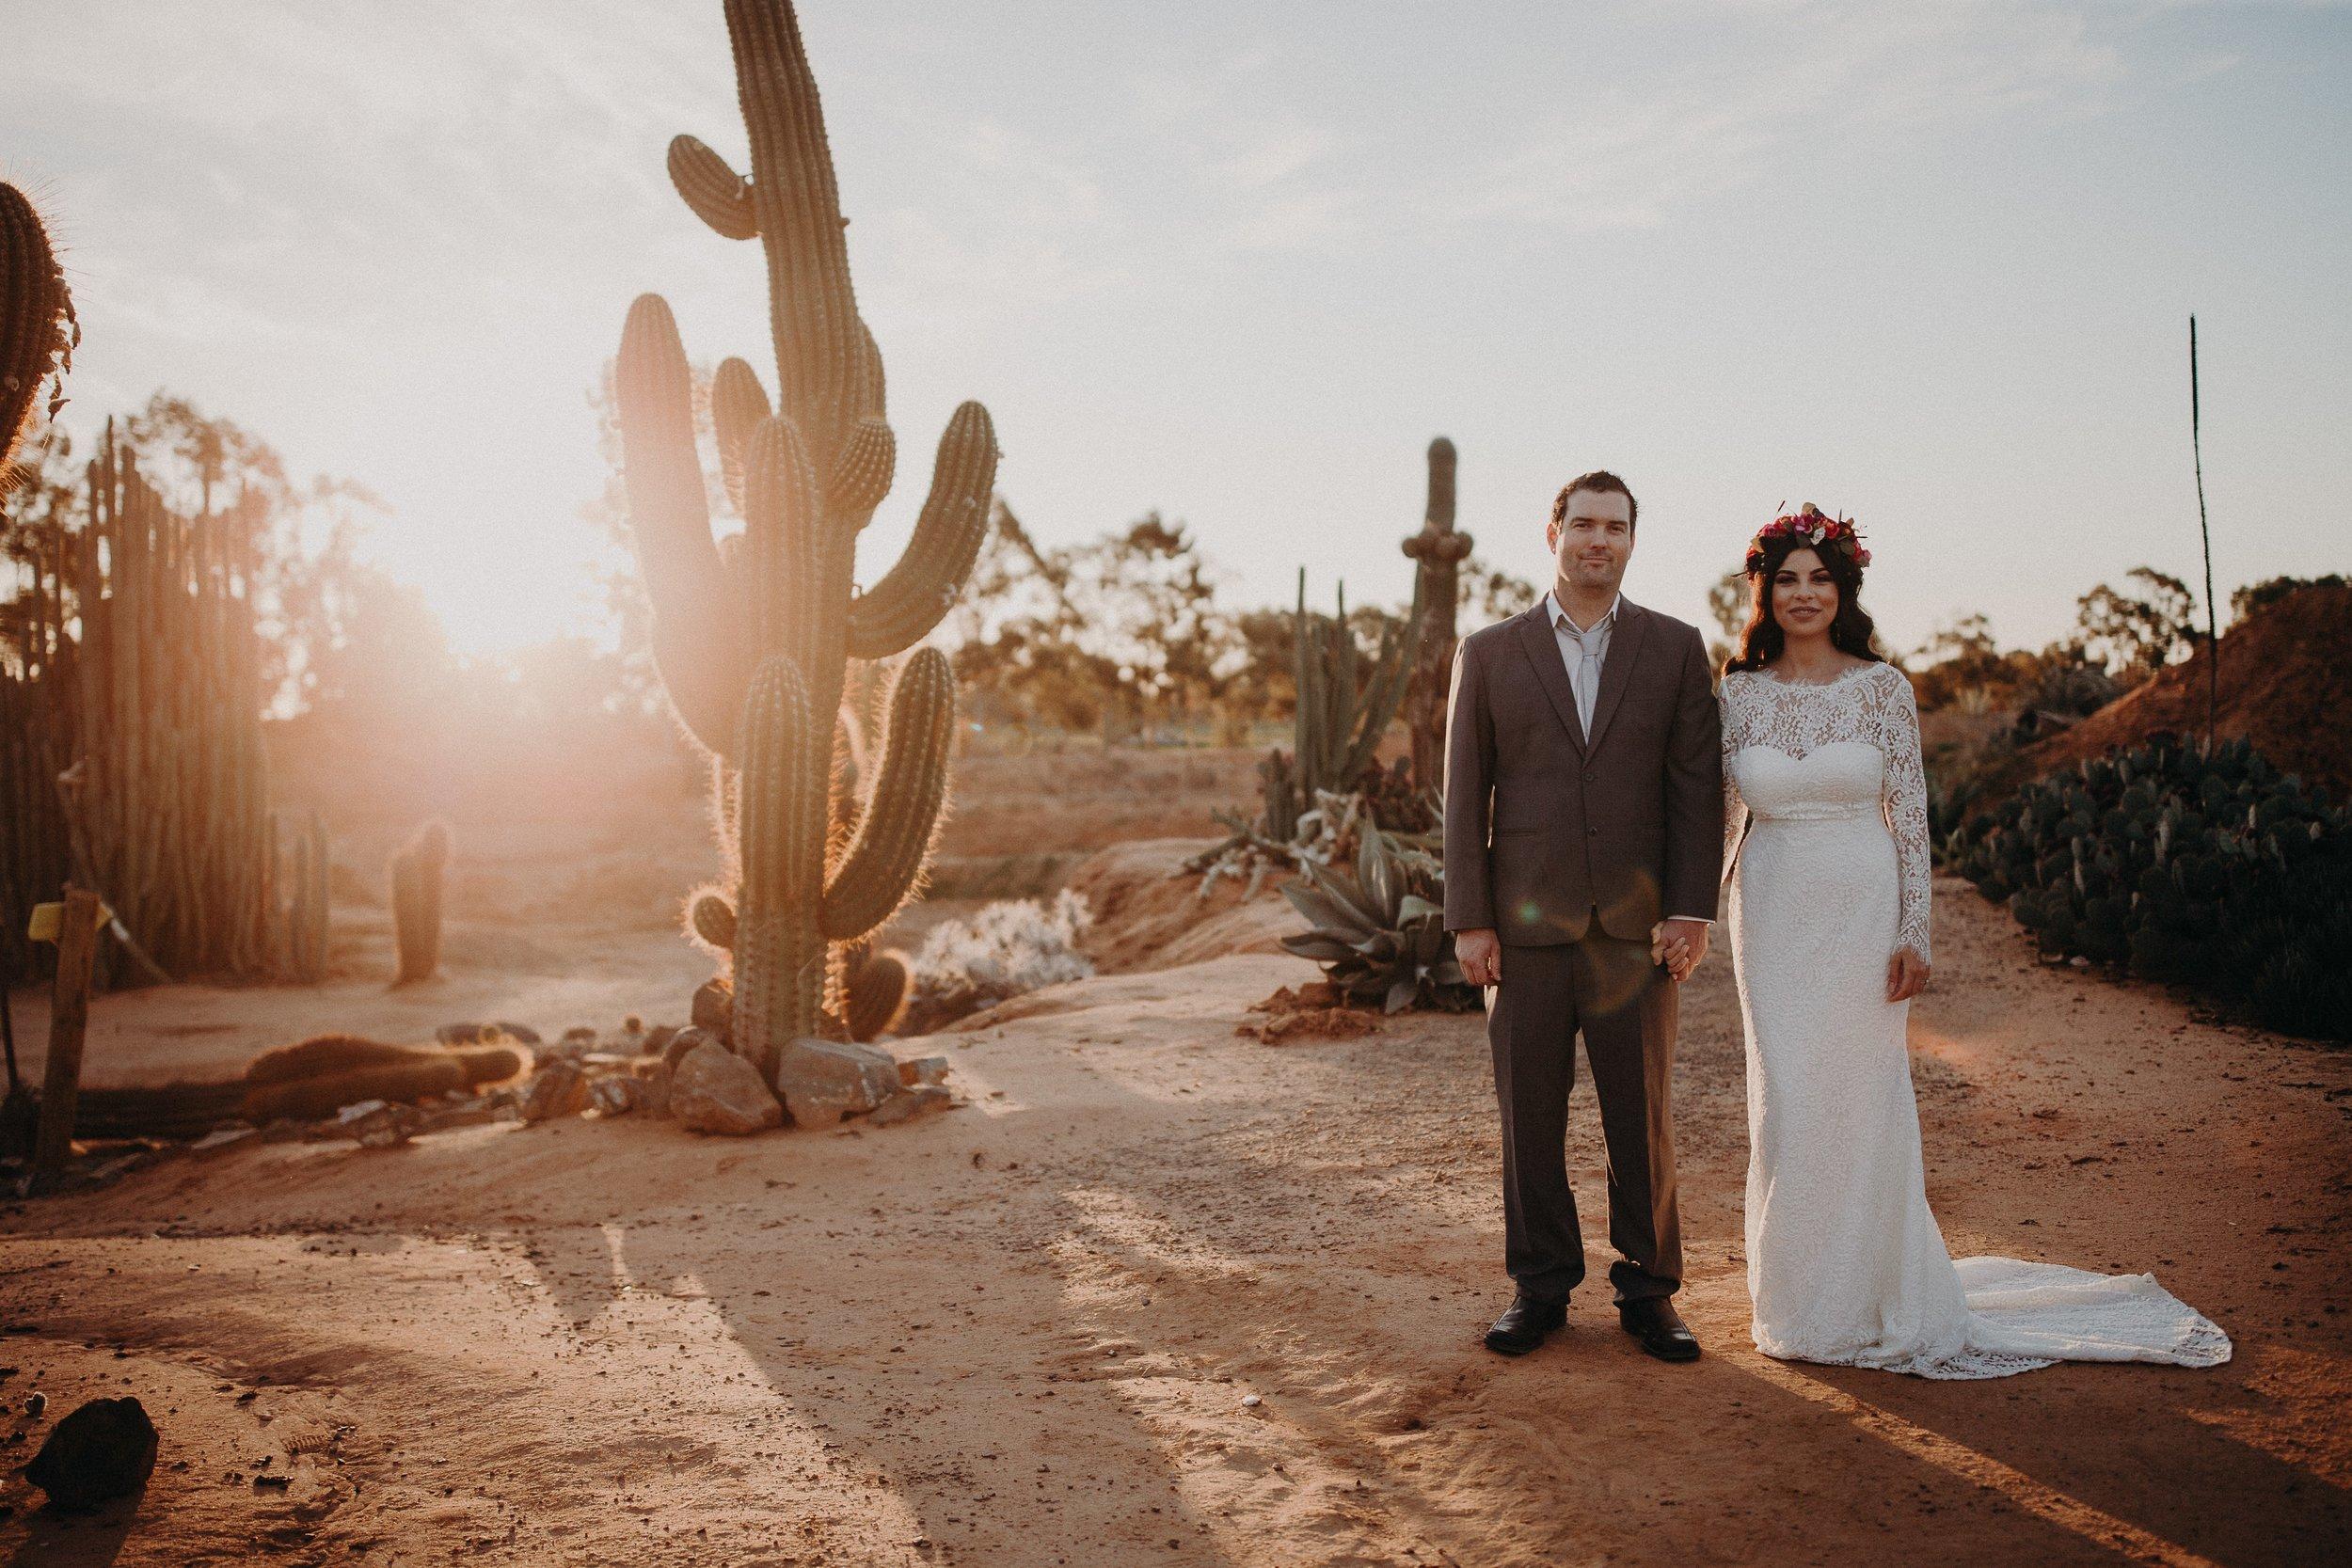 mickalathomas_puremacphotography_weddingphotographer_couplephotographer_Sheppartonphotographer_1458.jpg